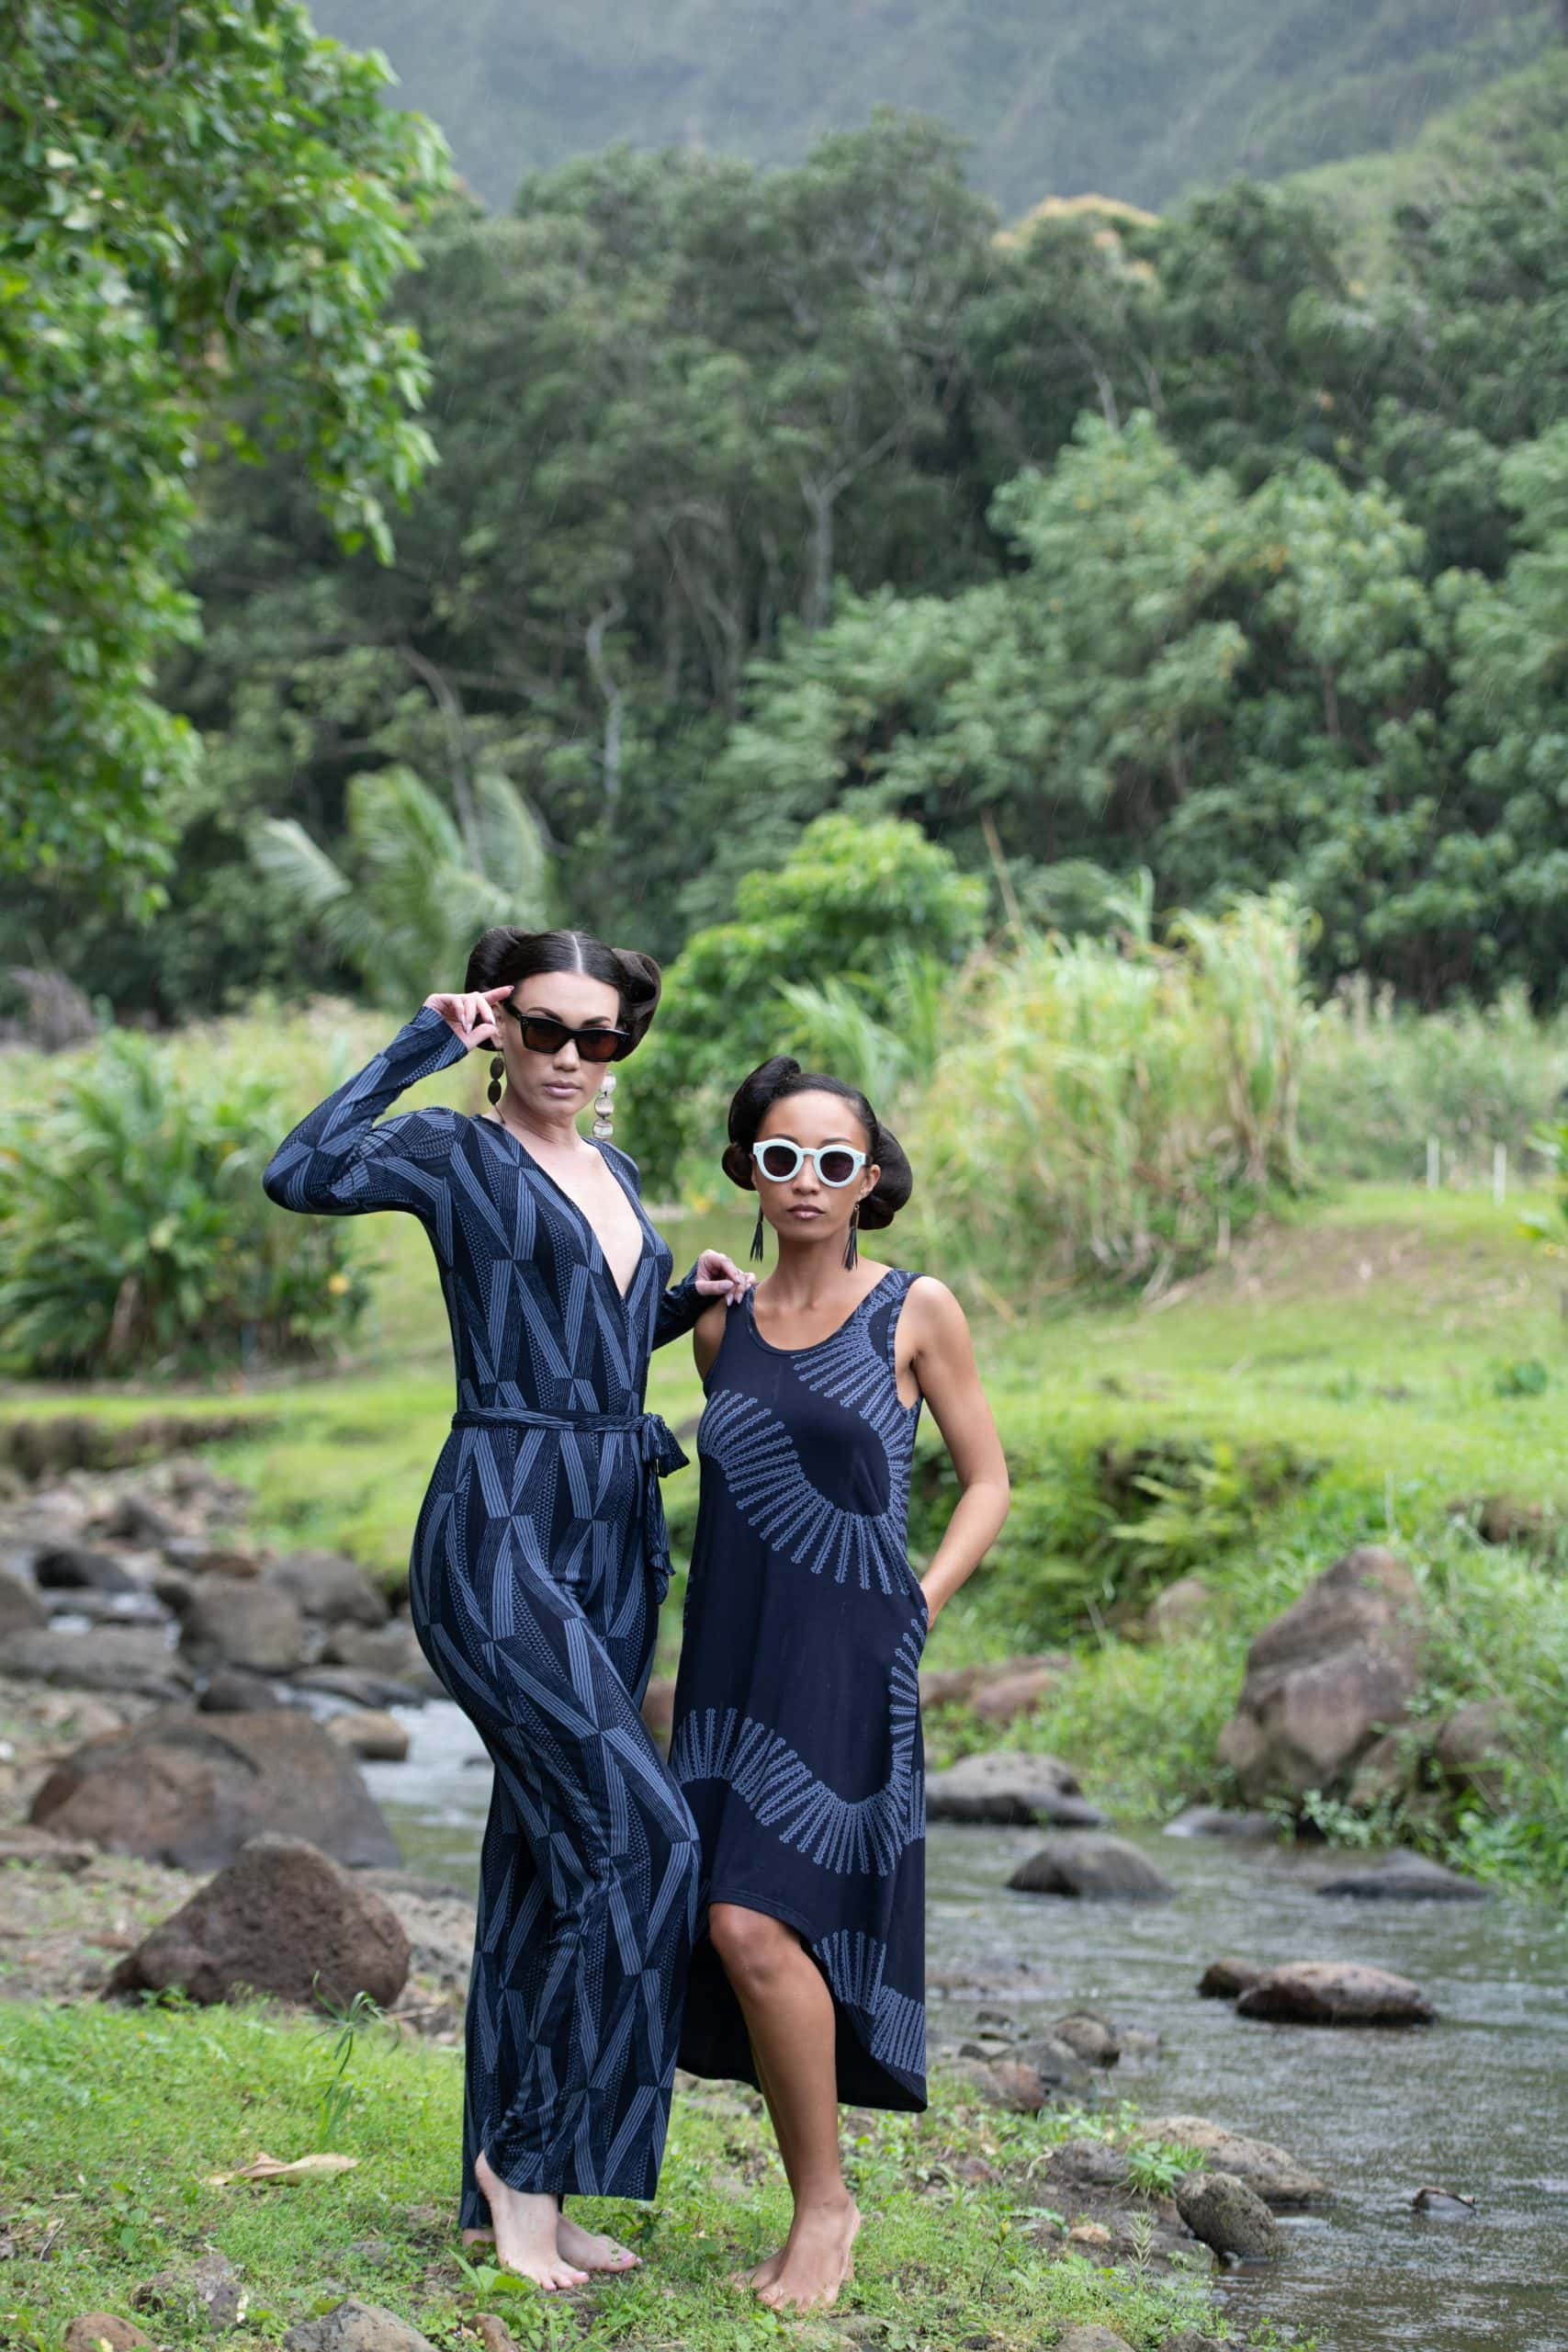 Model wearing Pualahaole Hi Low Dress in Deep Well/Folkstone Grey Lalani Kalalea - Front View